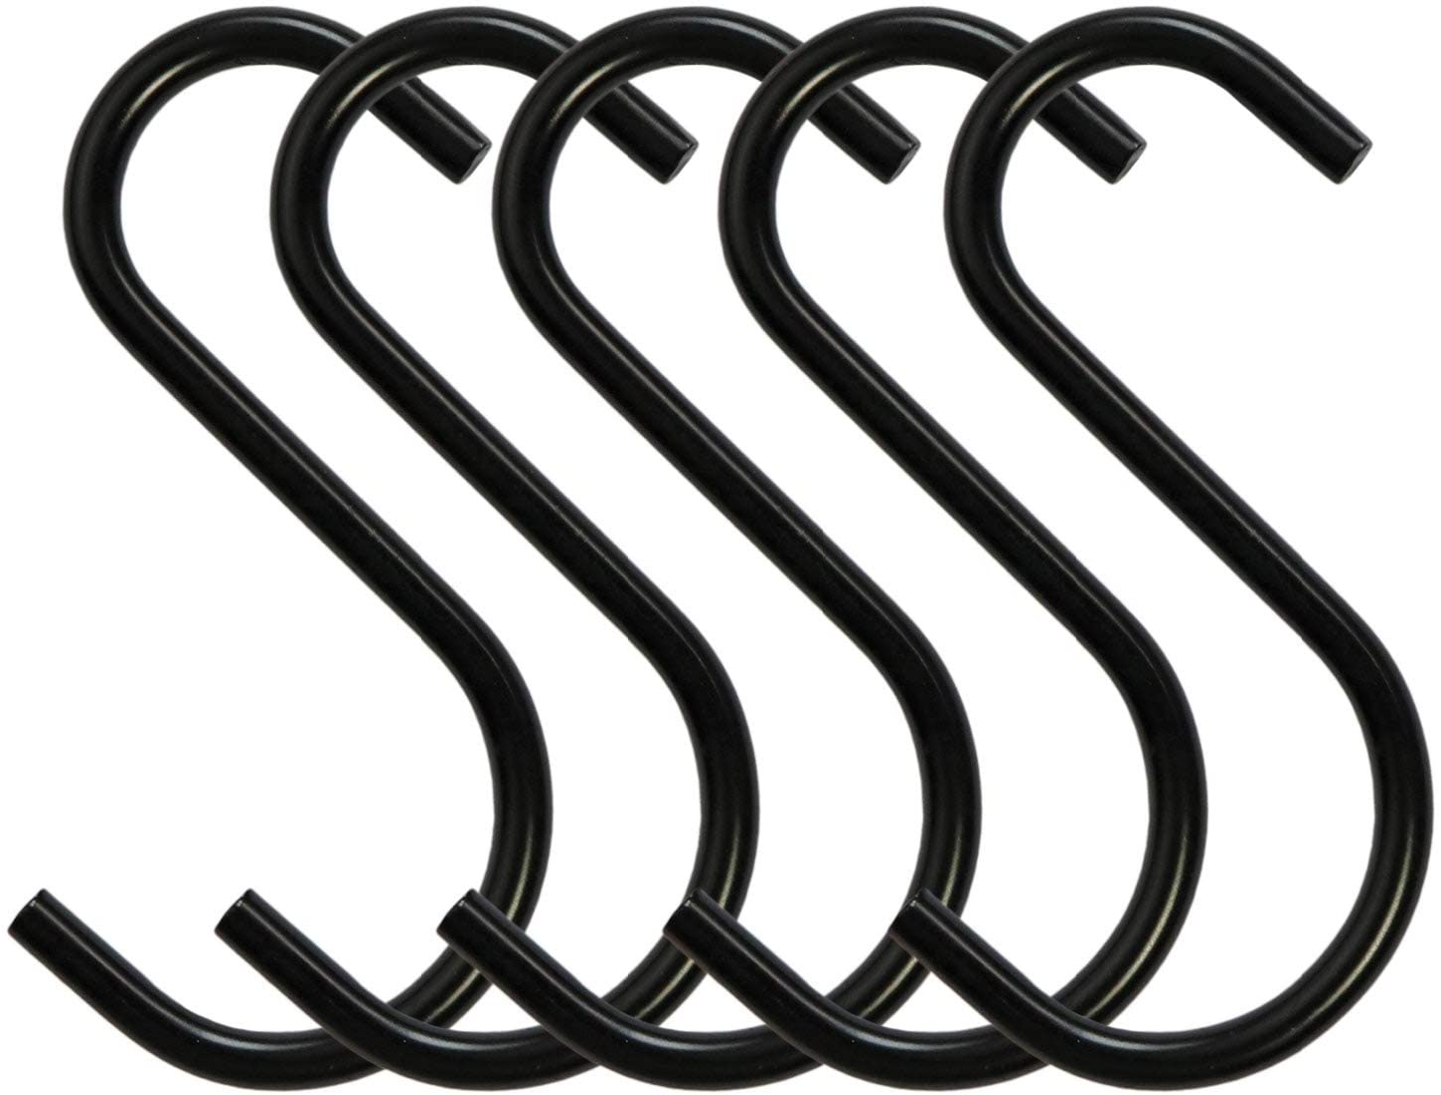 12 Pack Aluminum S Shaped Hooks Matte Finish S Hooks Hanging Pots Pans Plants